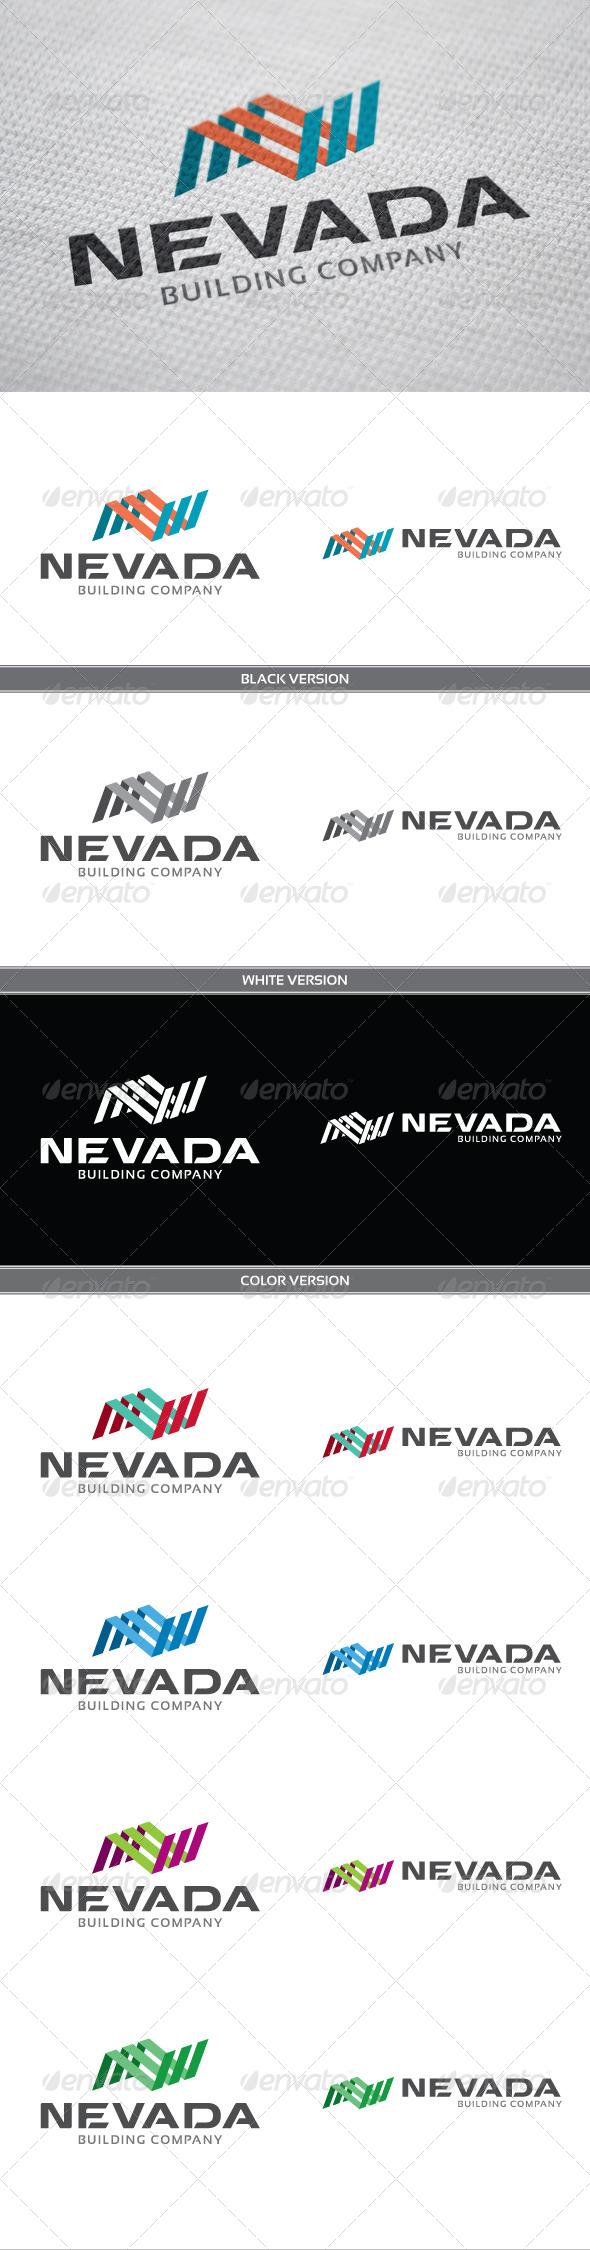 GraphicRiver Nevada 4070614